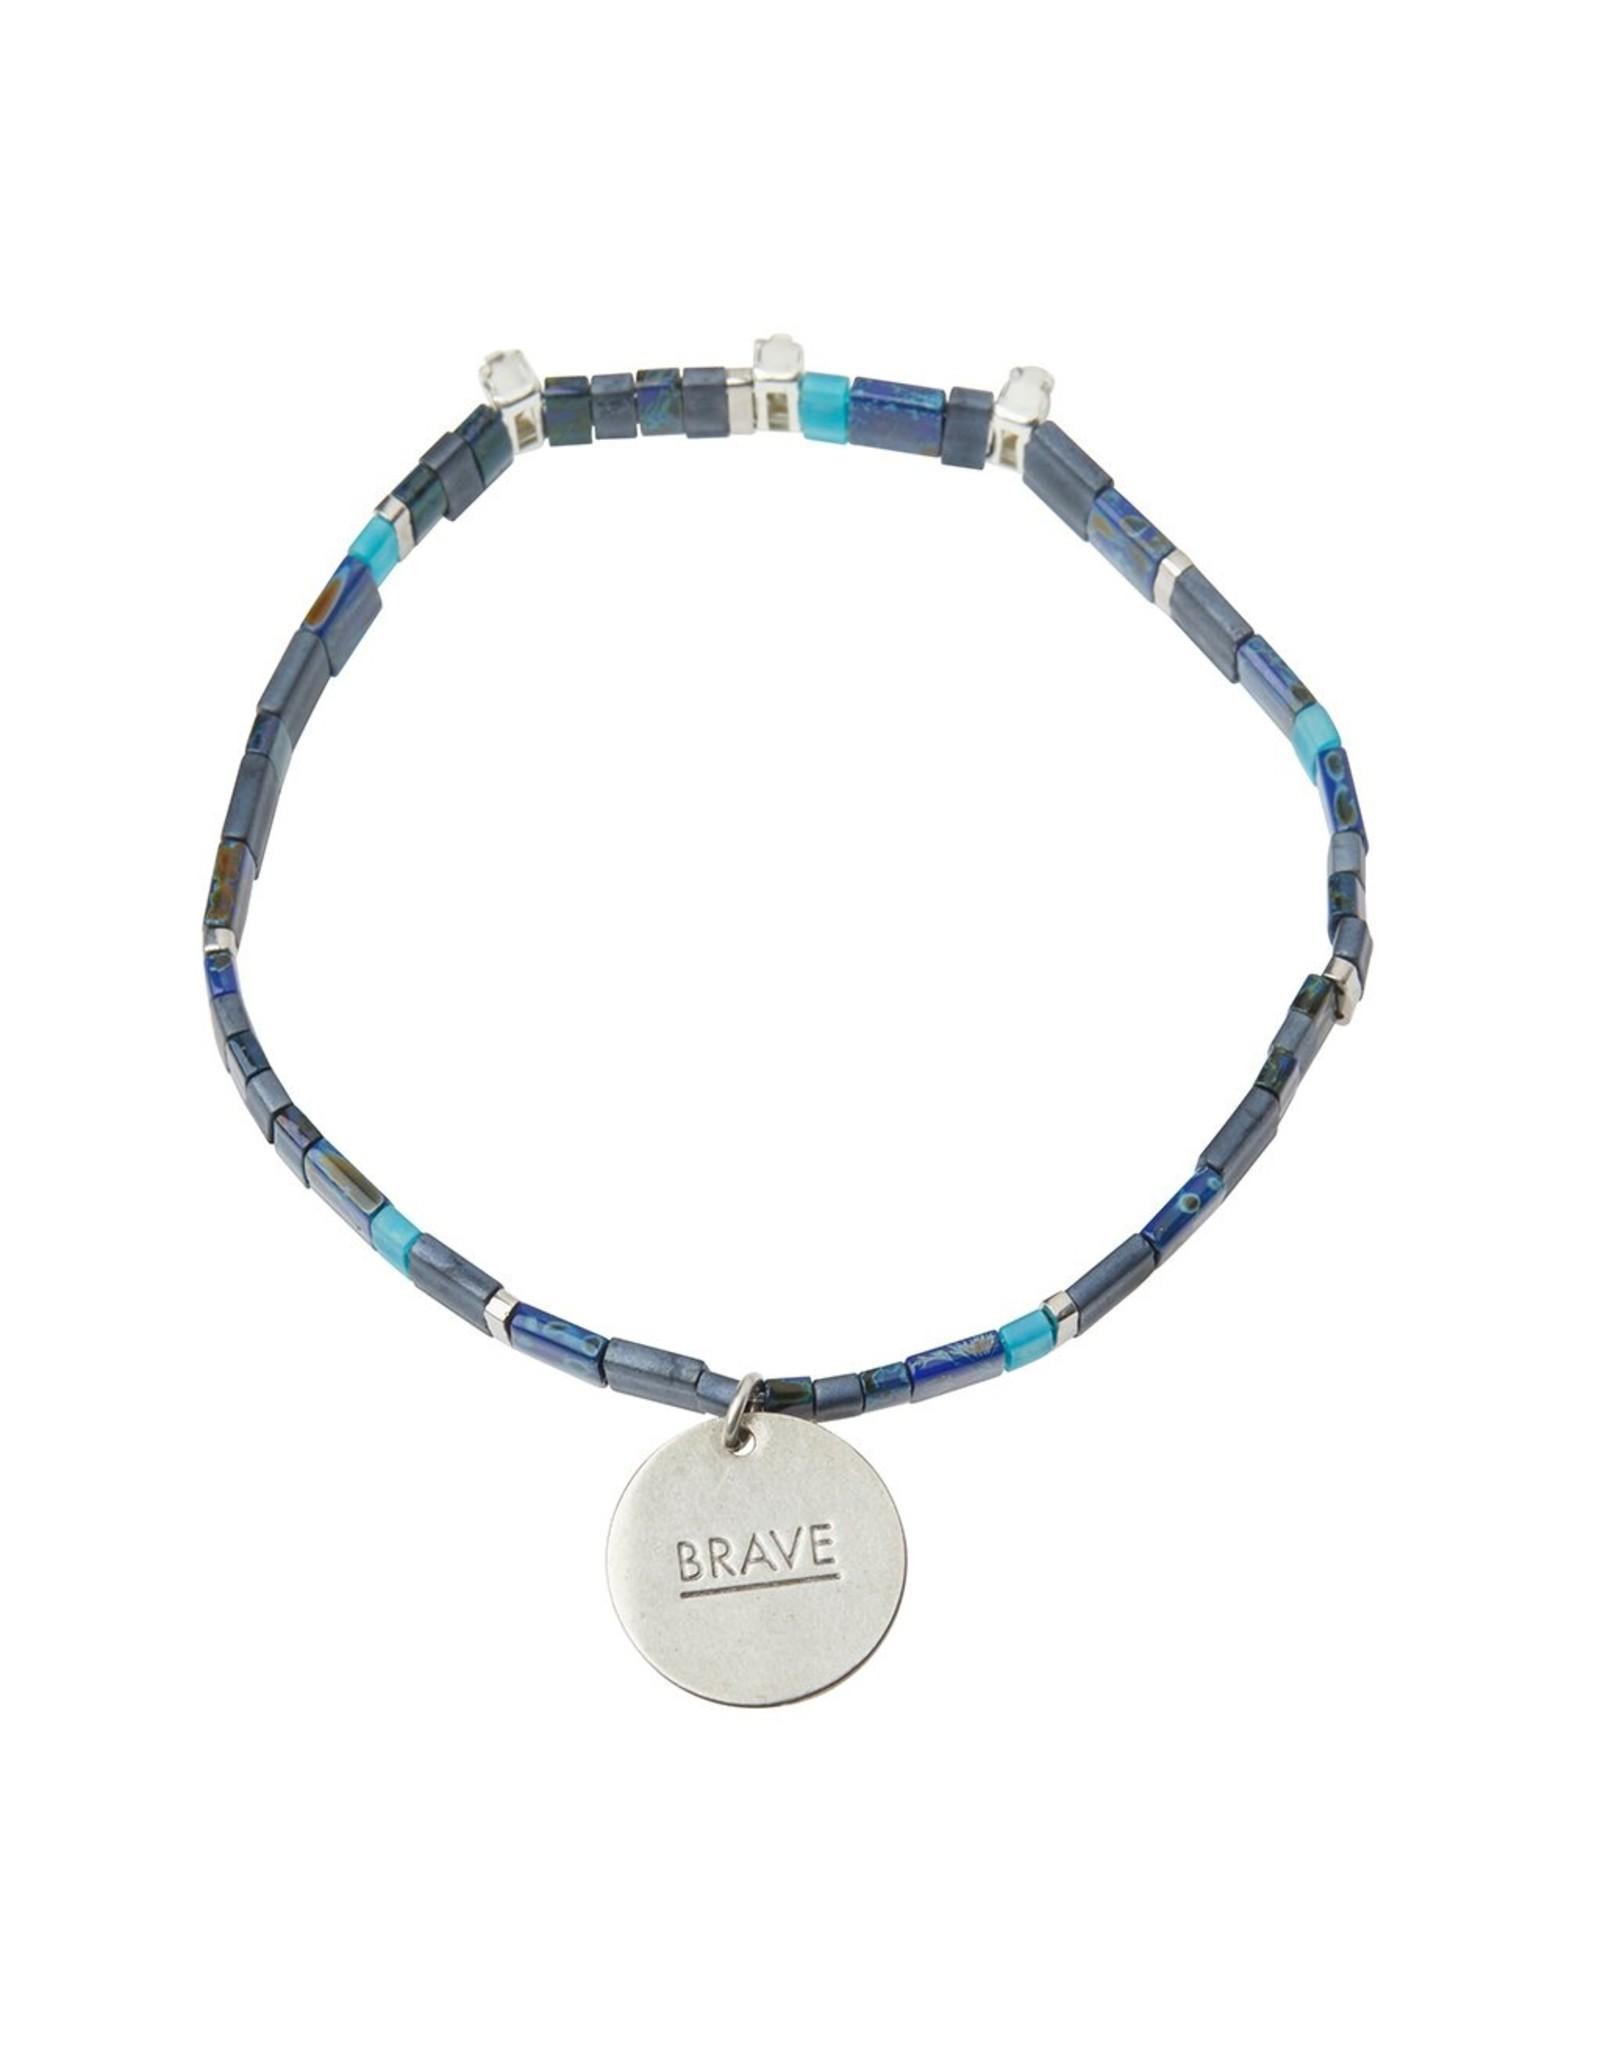 Good Karma Charm Bracelet, Brave, midnight/sparkle/silver